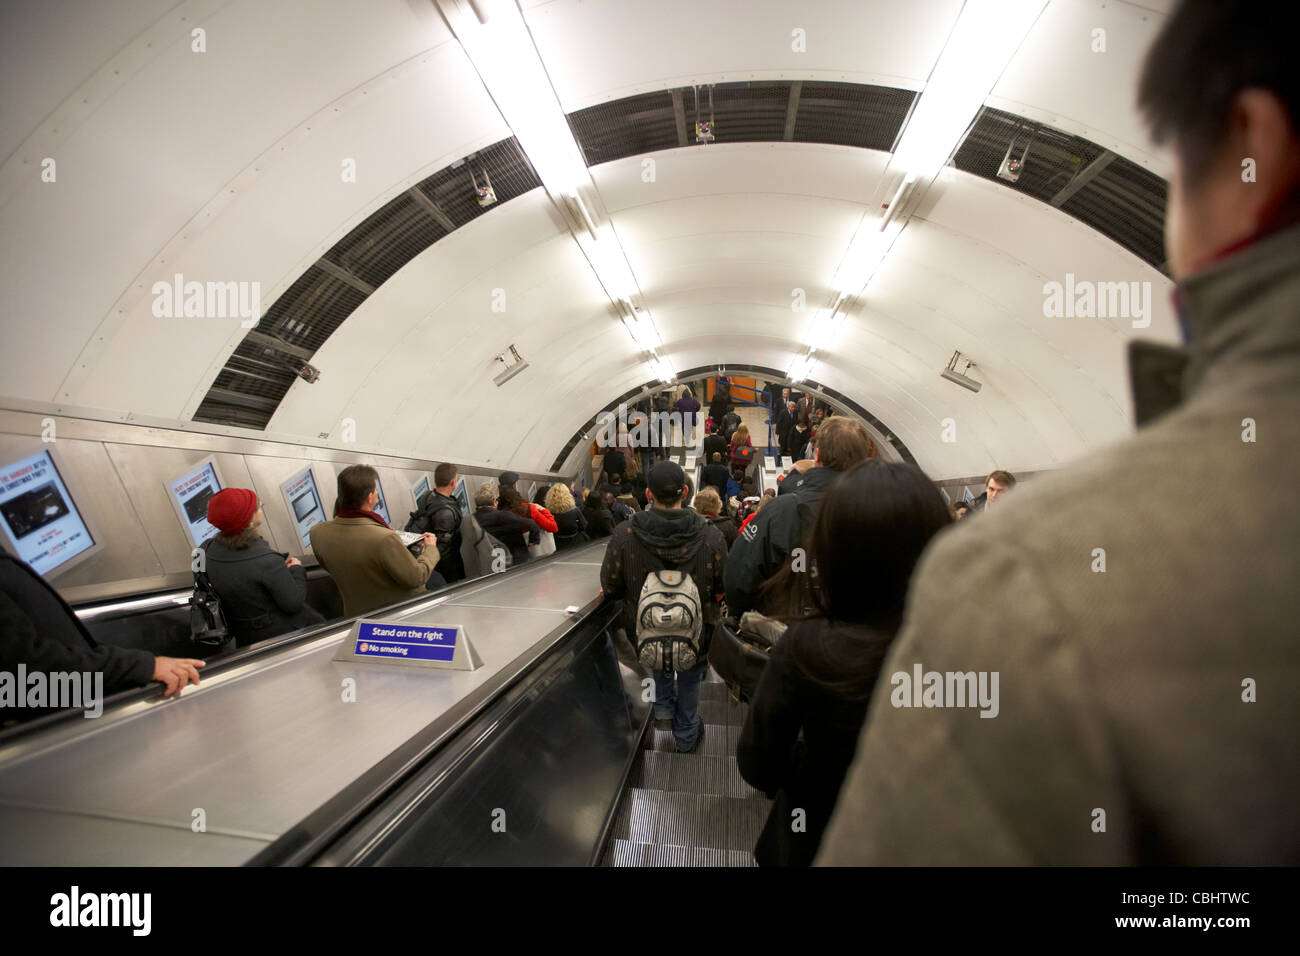 passengers and commuters on the escalator at a london underground tube station england united kingdom uk - Stock Image